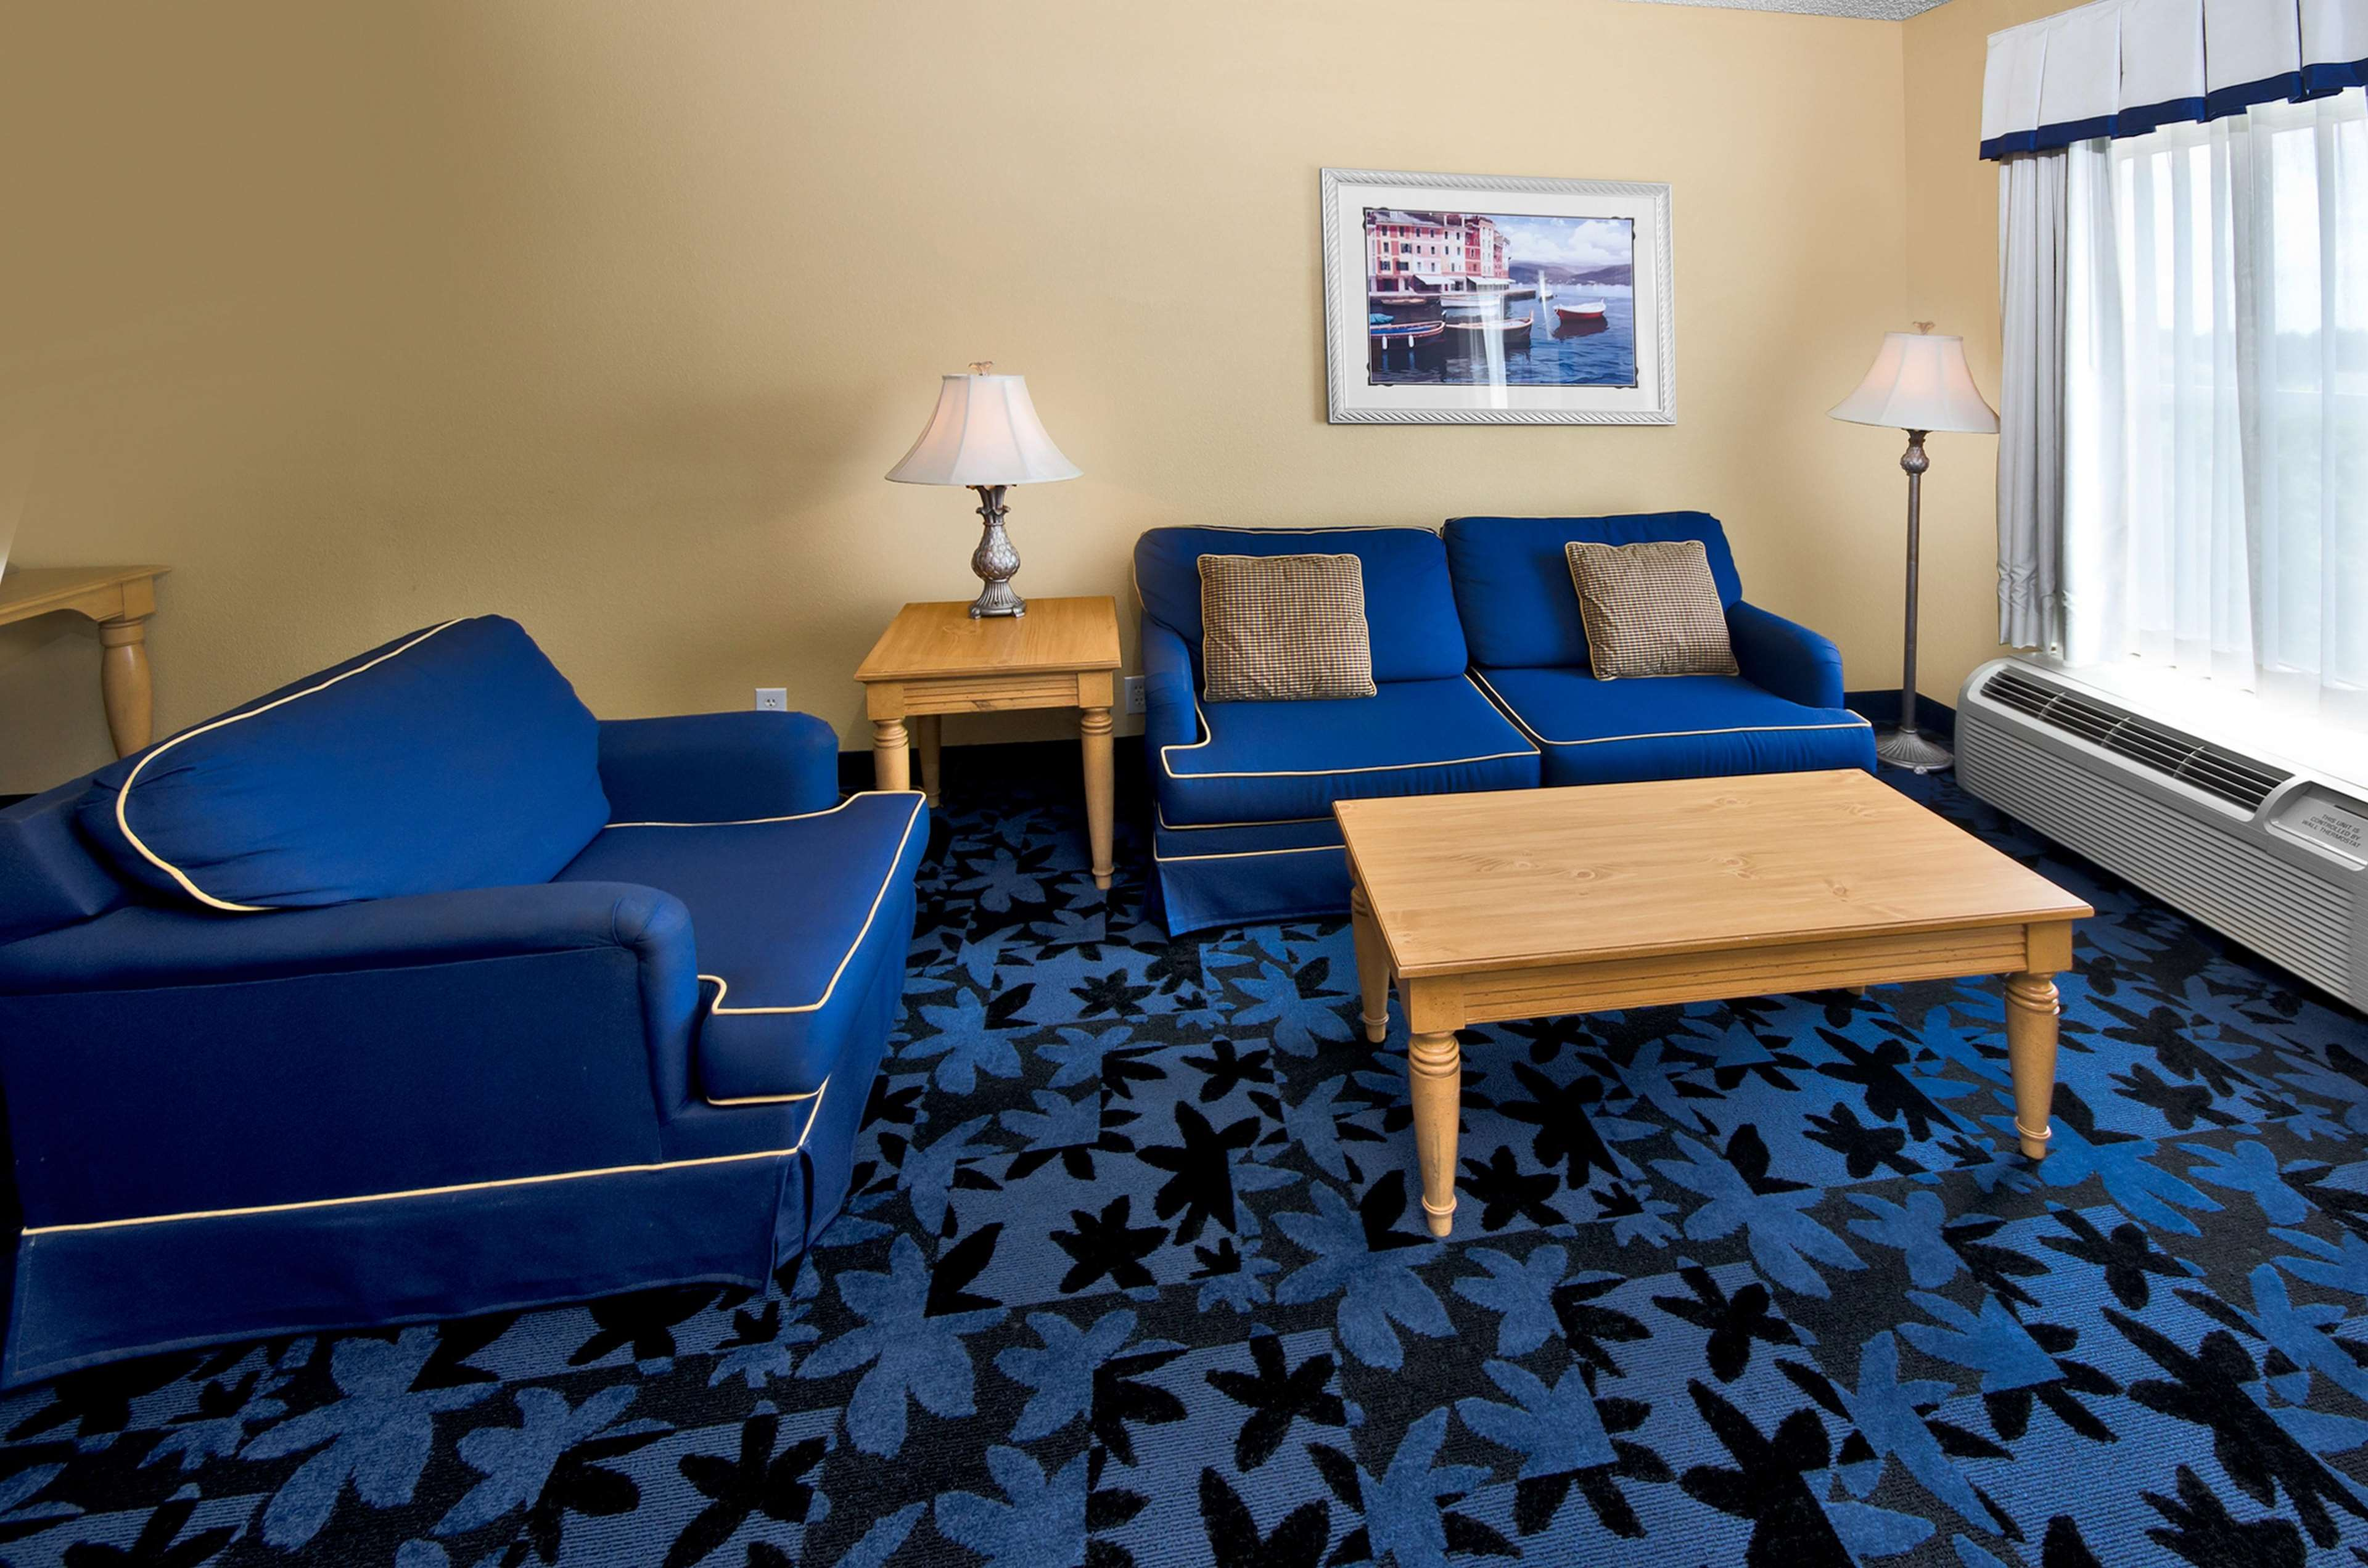 Hampton Inn & Suites Jacksonville South-St. Johns Town Center Area image 28